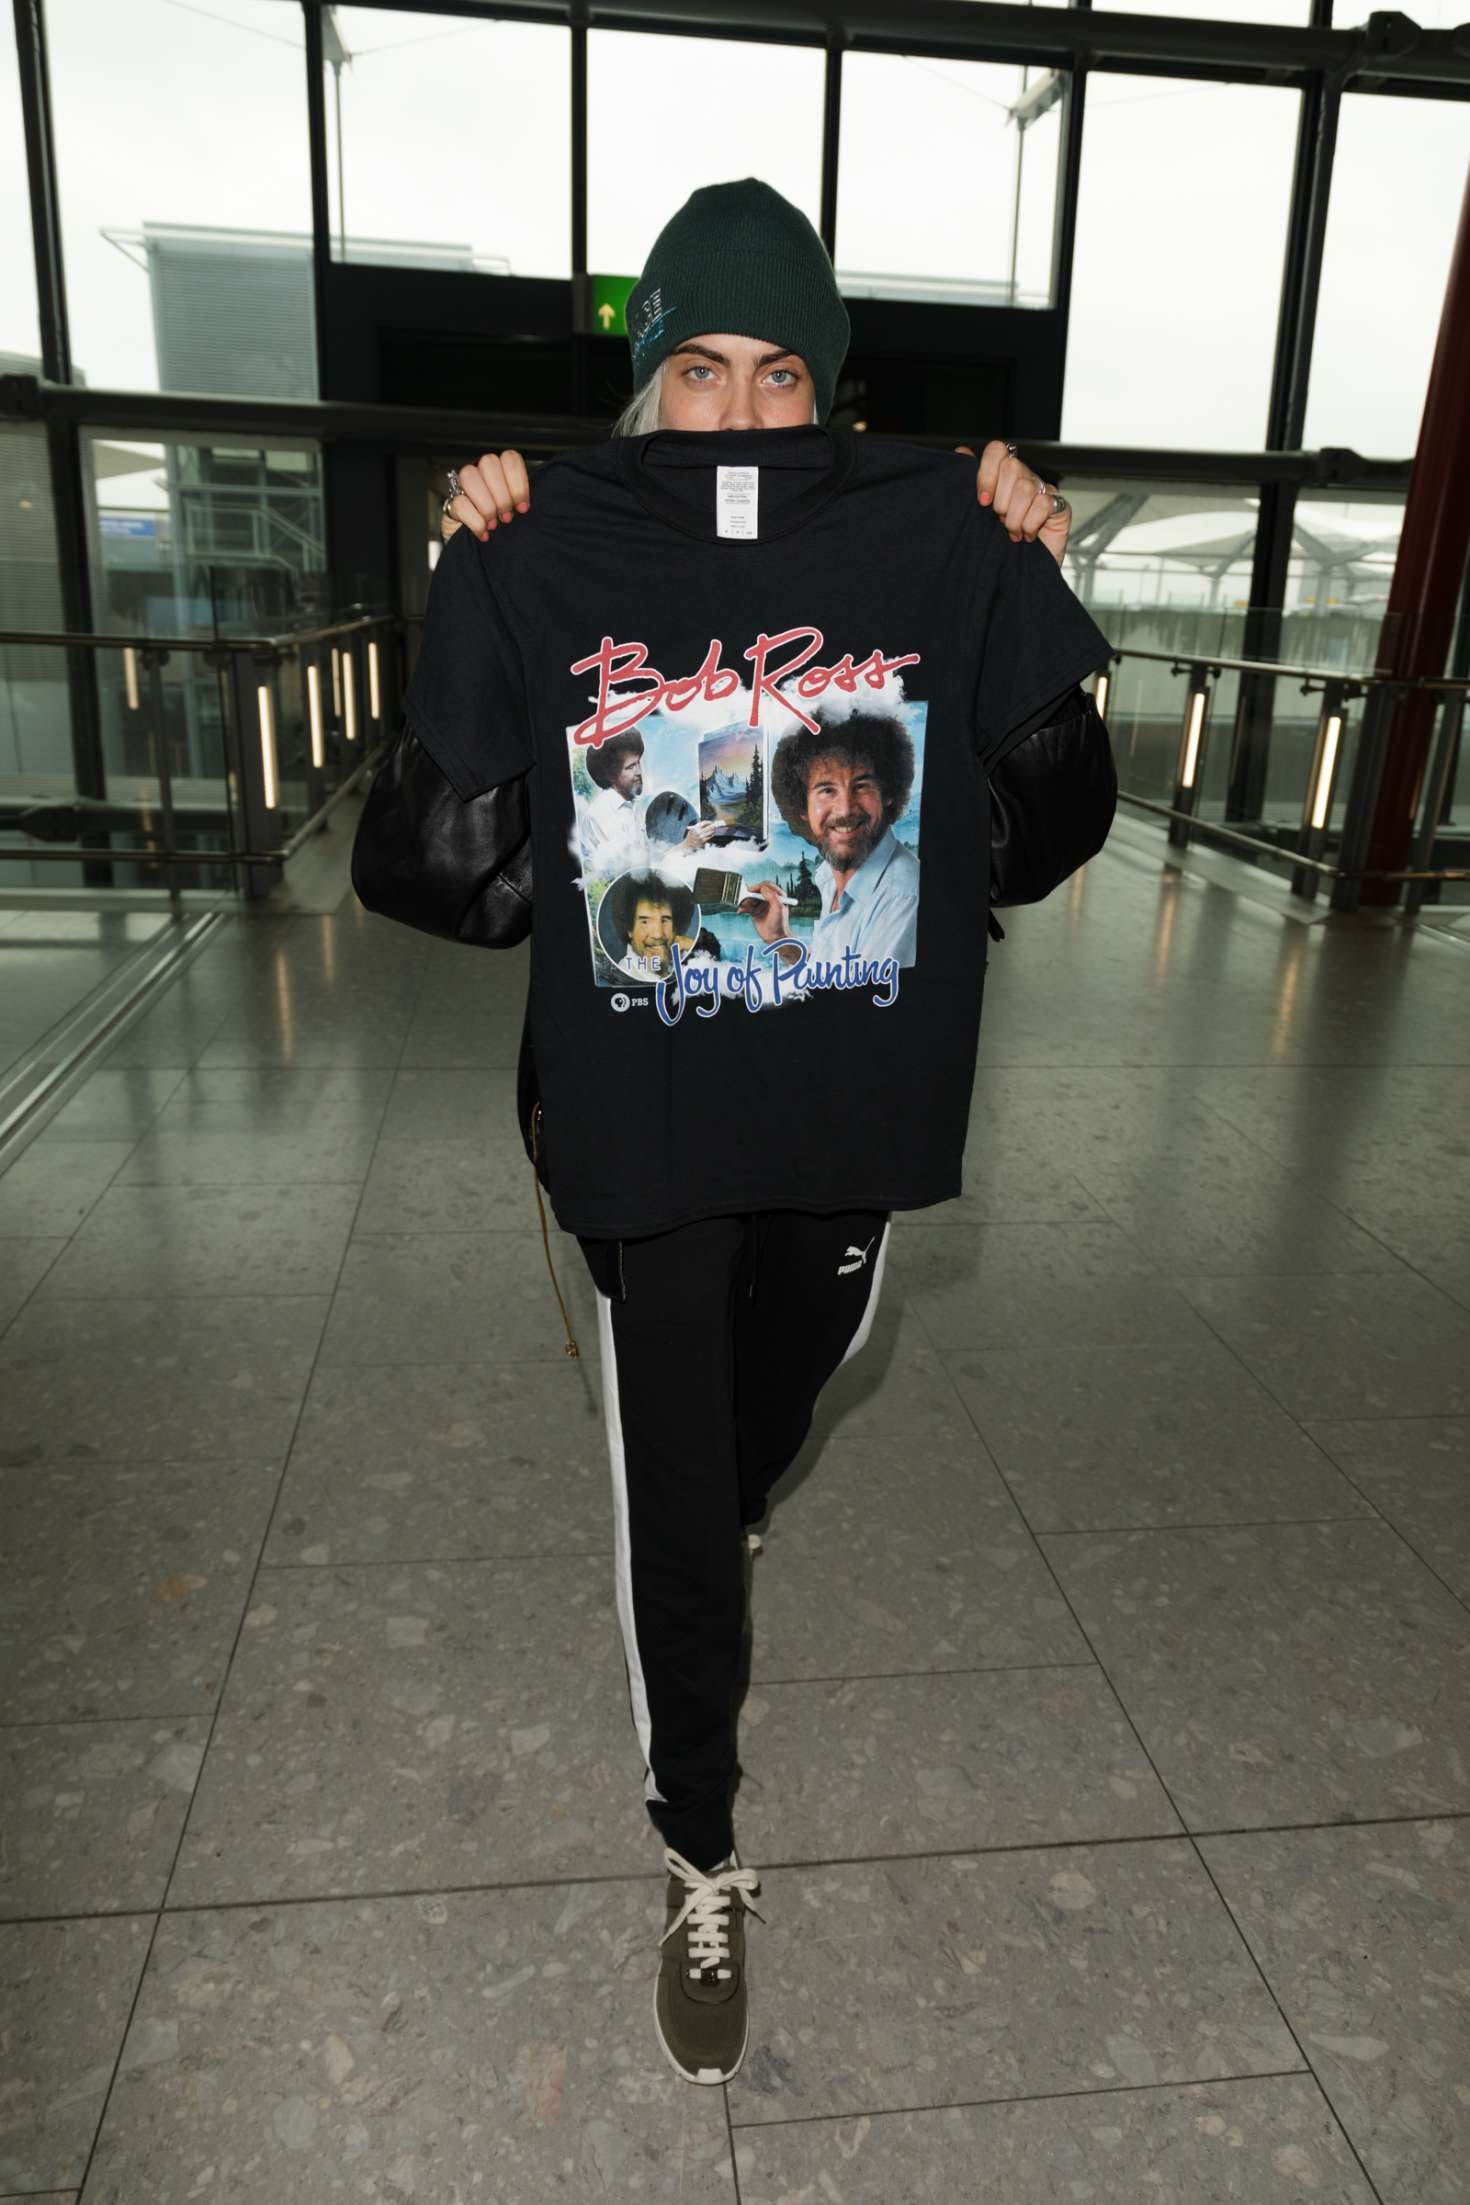 Cara Delevingne showcased the nice T-shirt